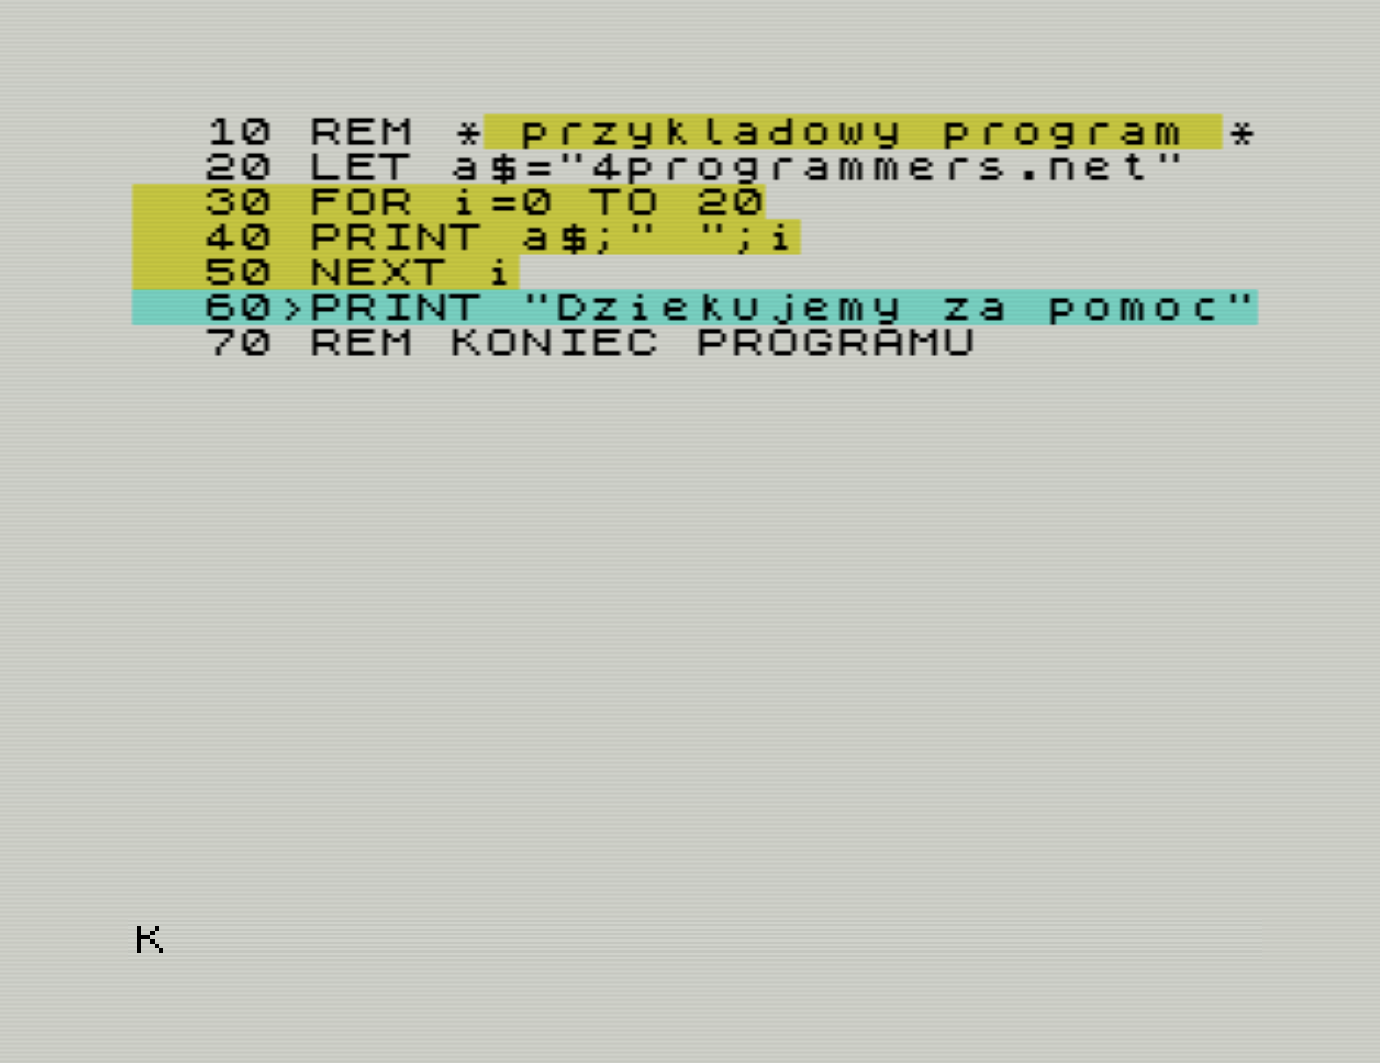 screenshot-20201017220705.png